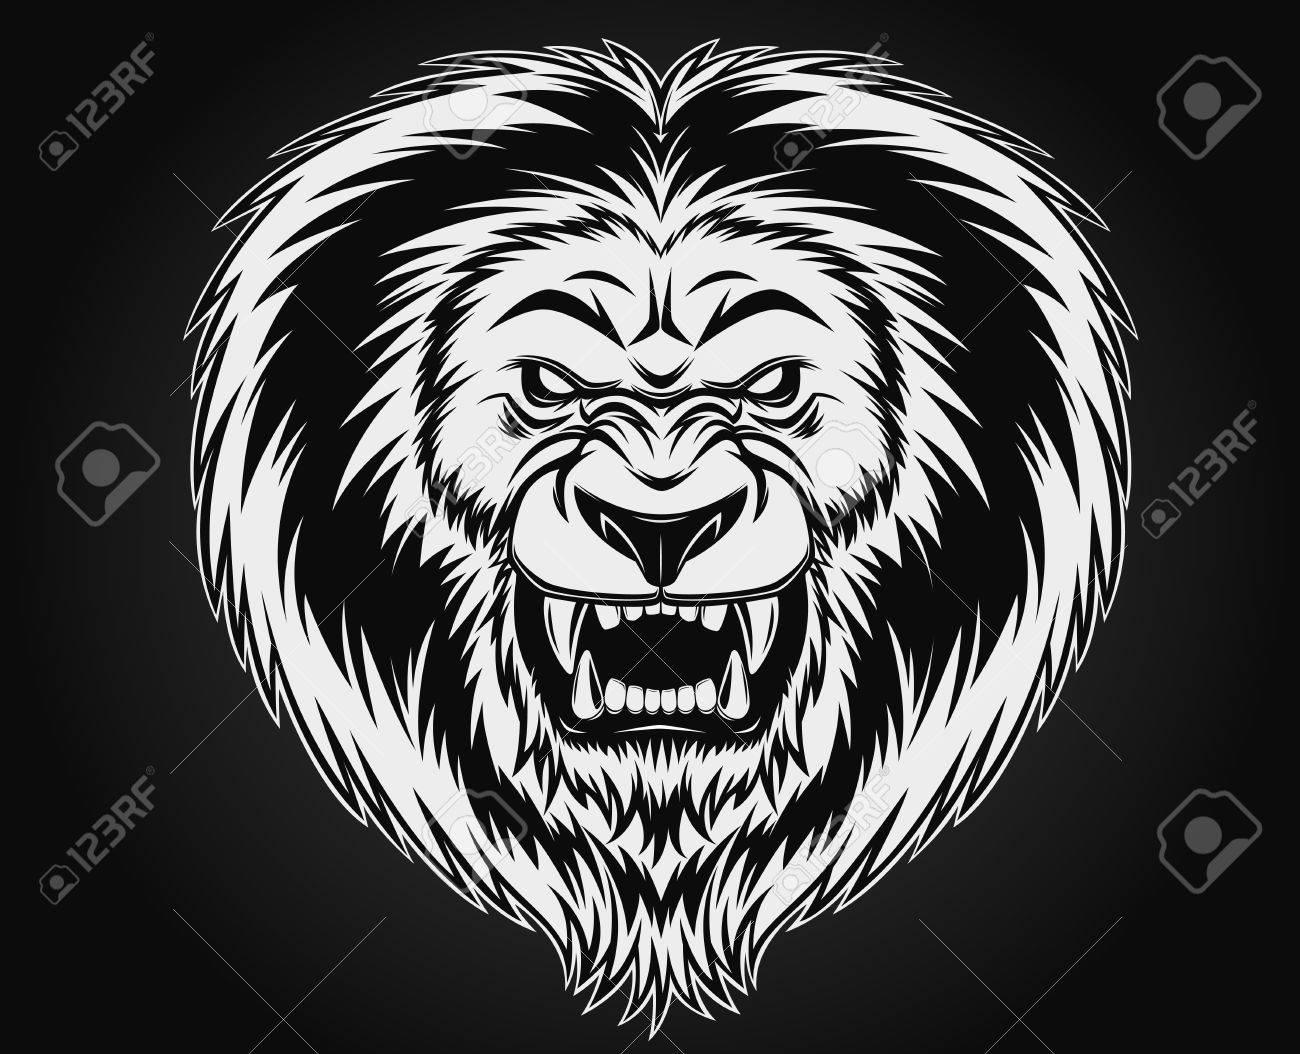 fierce lion head illustration